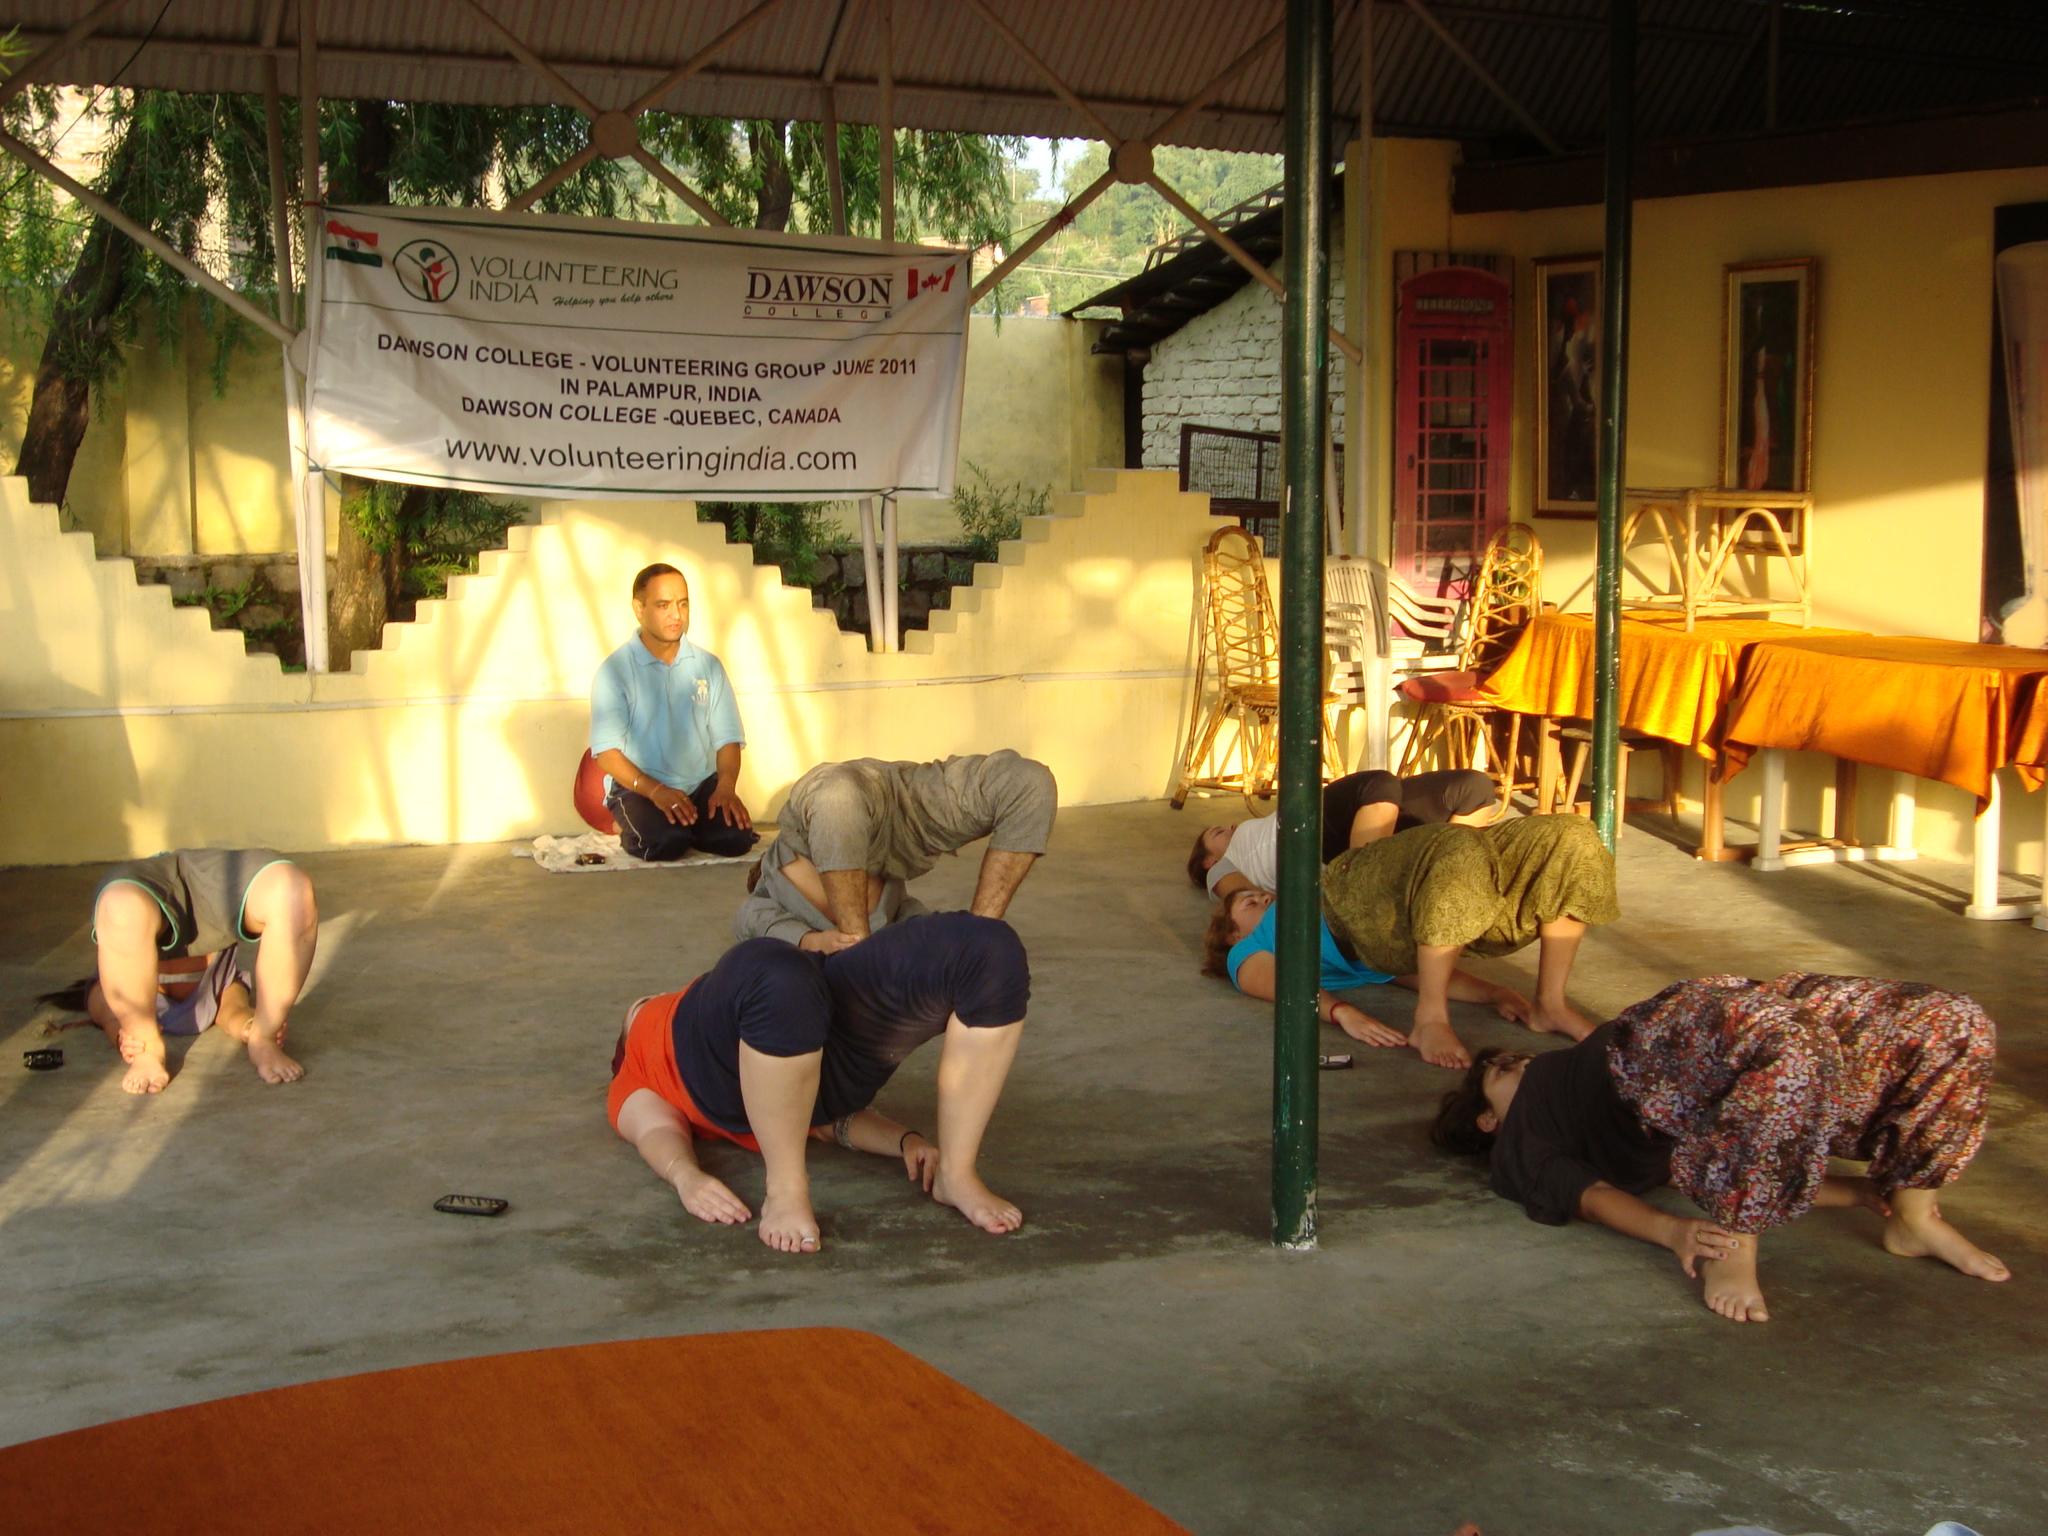 yoga & volunteer adventure in palampur